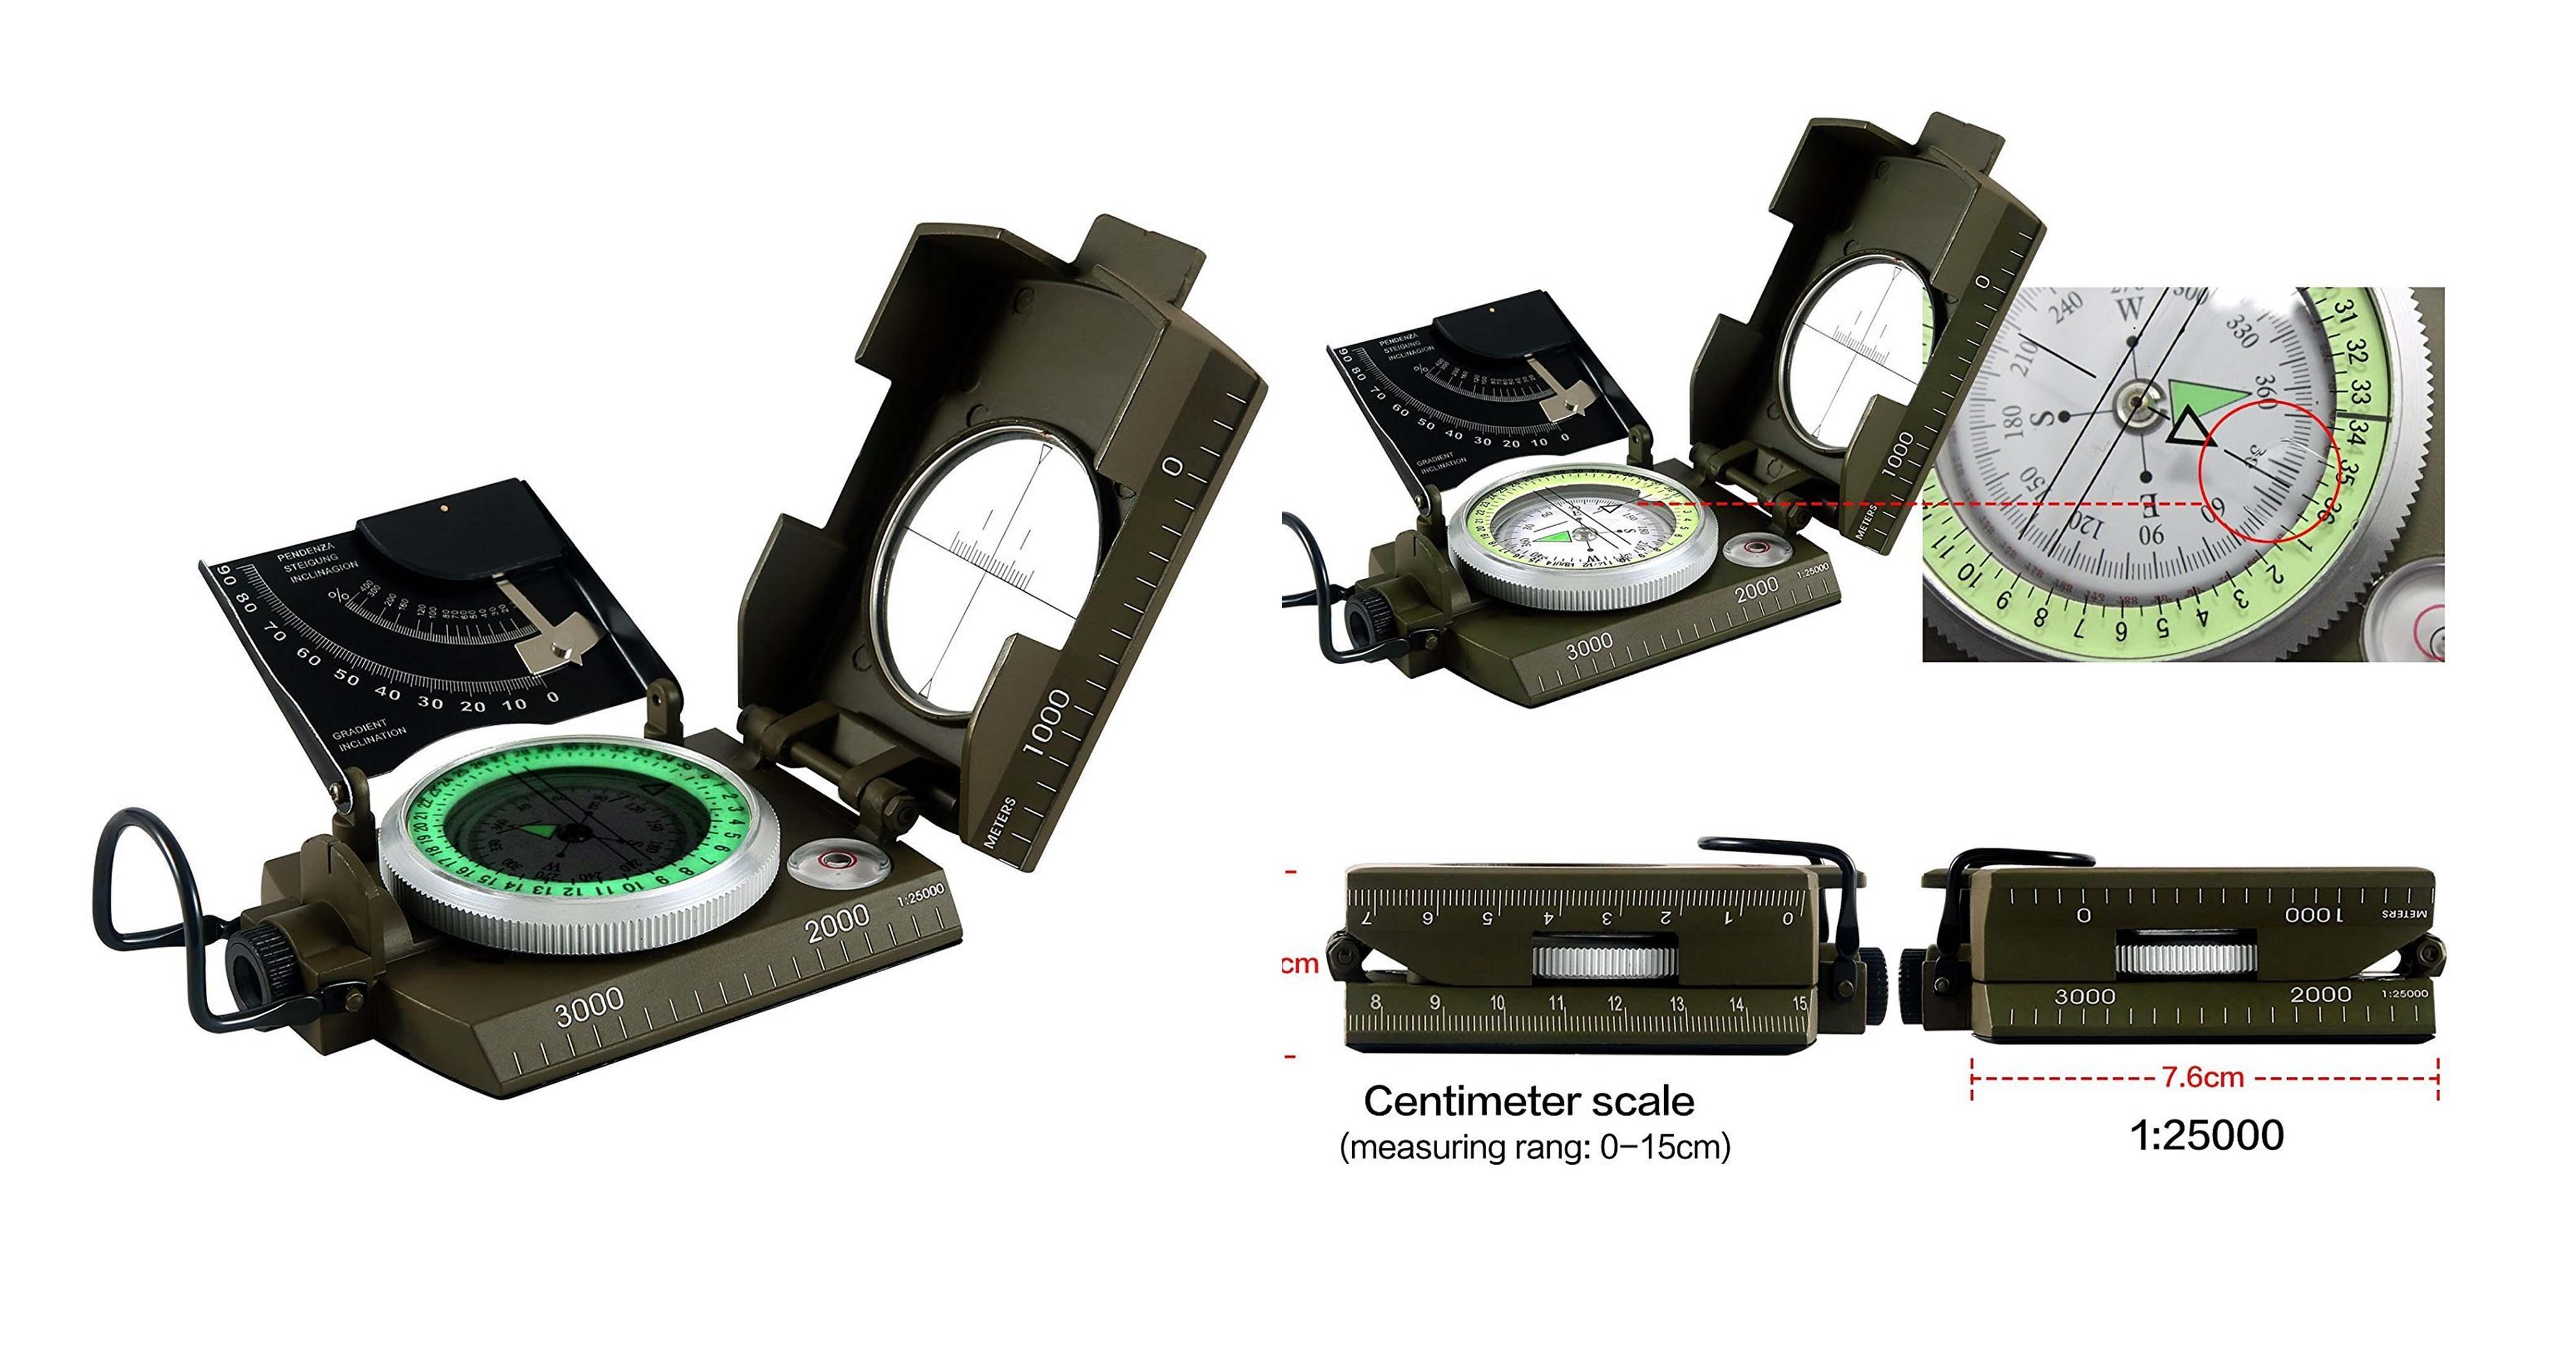 Eyeskey Waterproof Multifunctional Military Metal Sighting Compass with Inclinometer